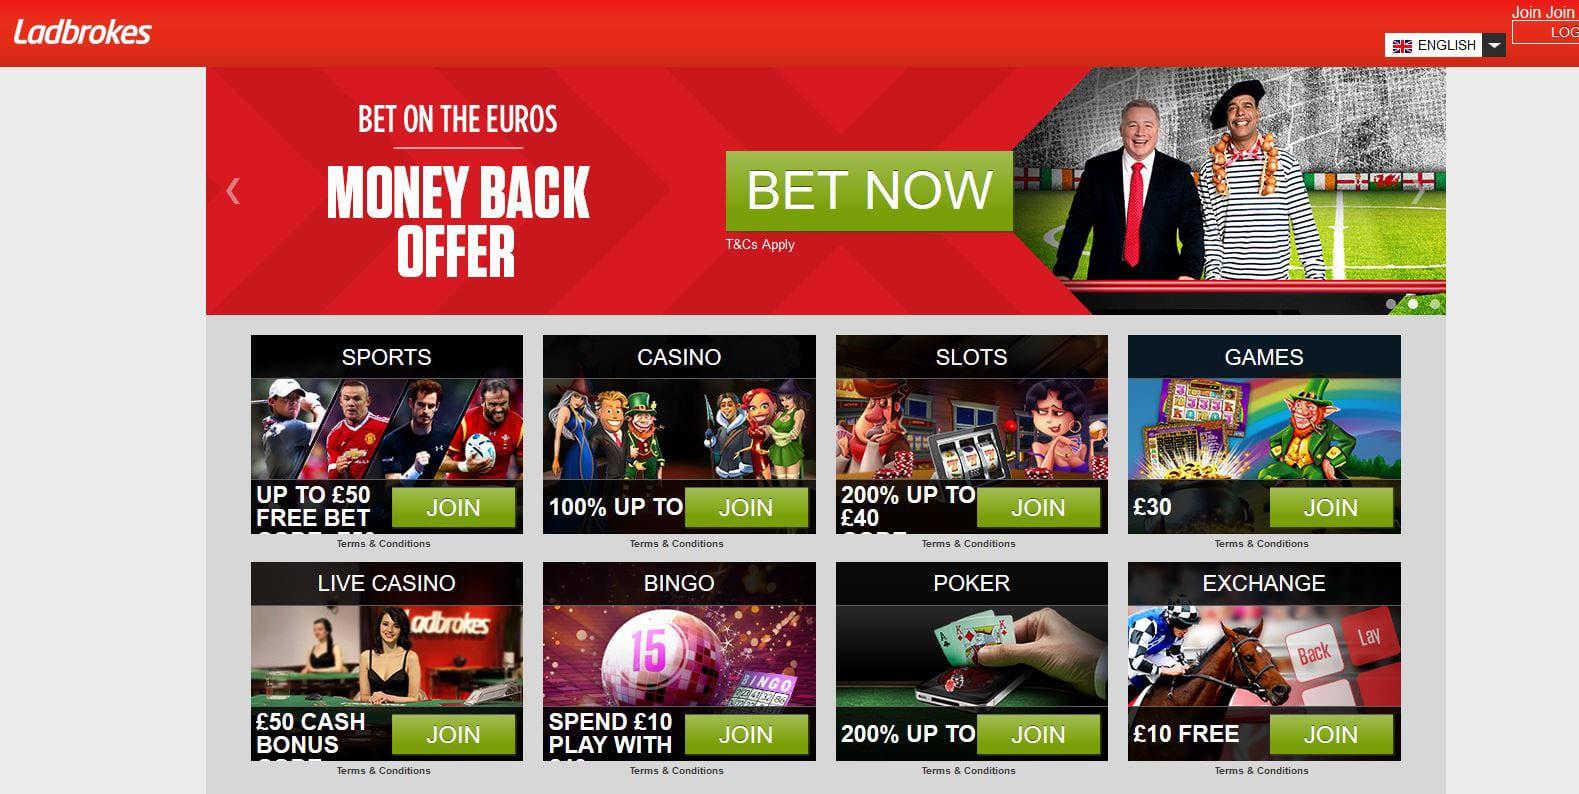 www.ladbrokes.com casino